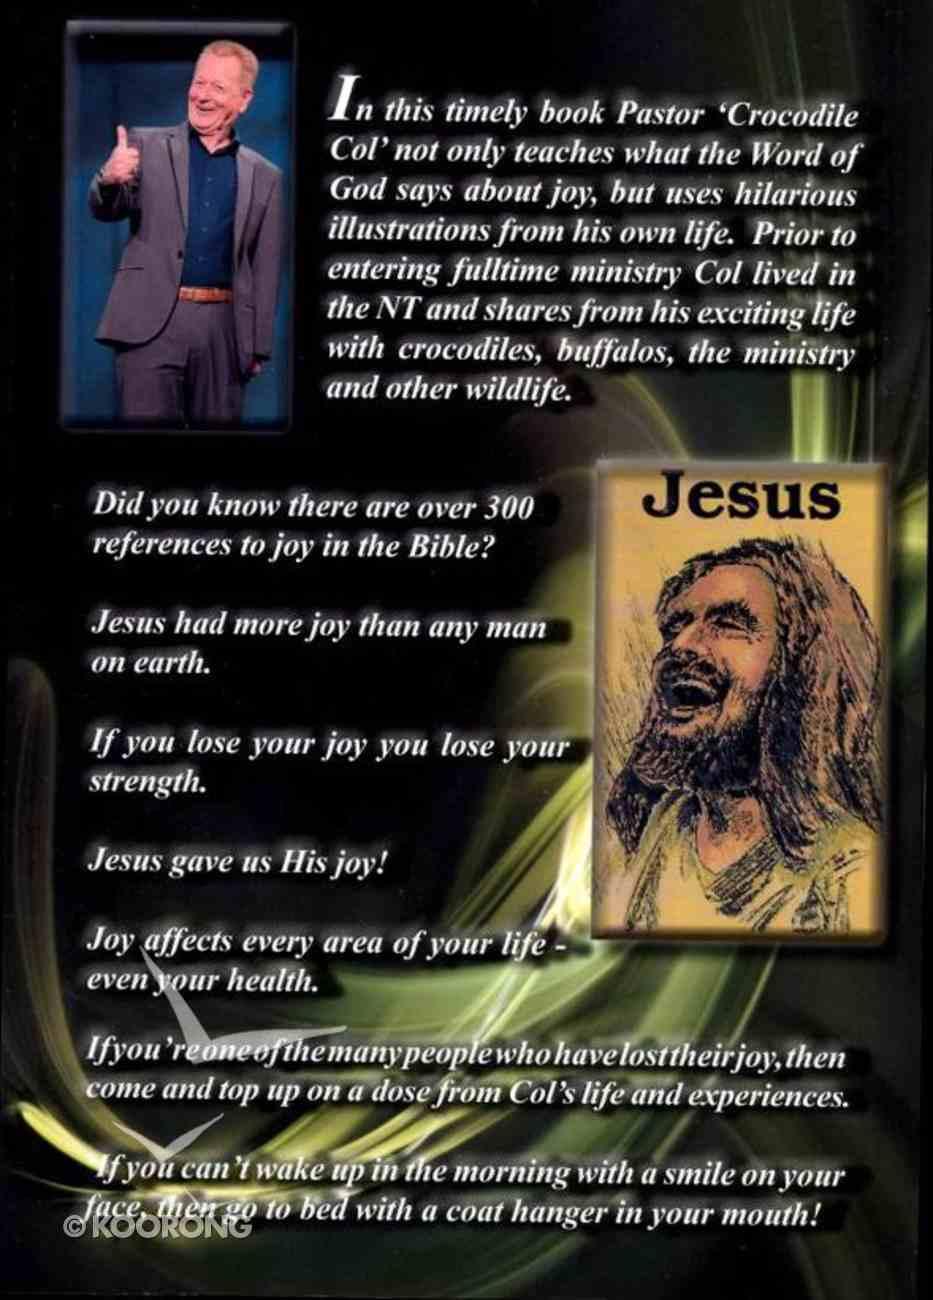 Lost Your Joy? Paperback